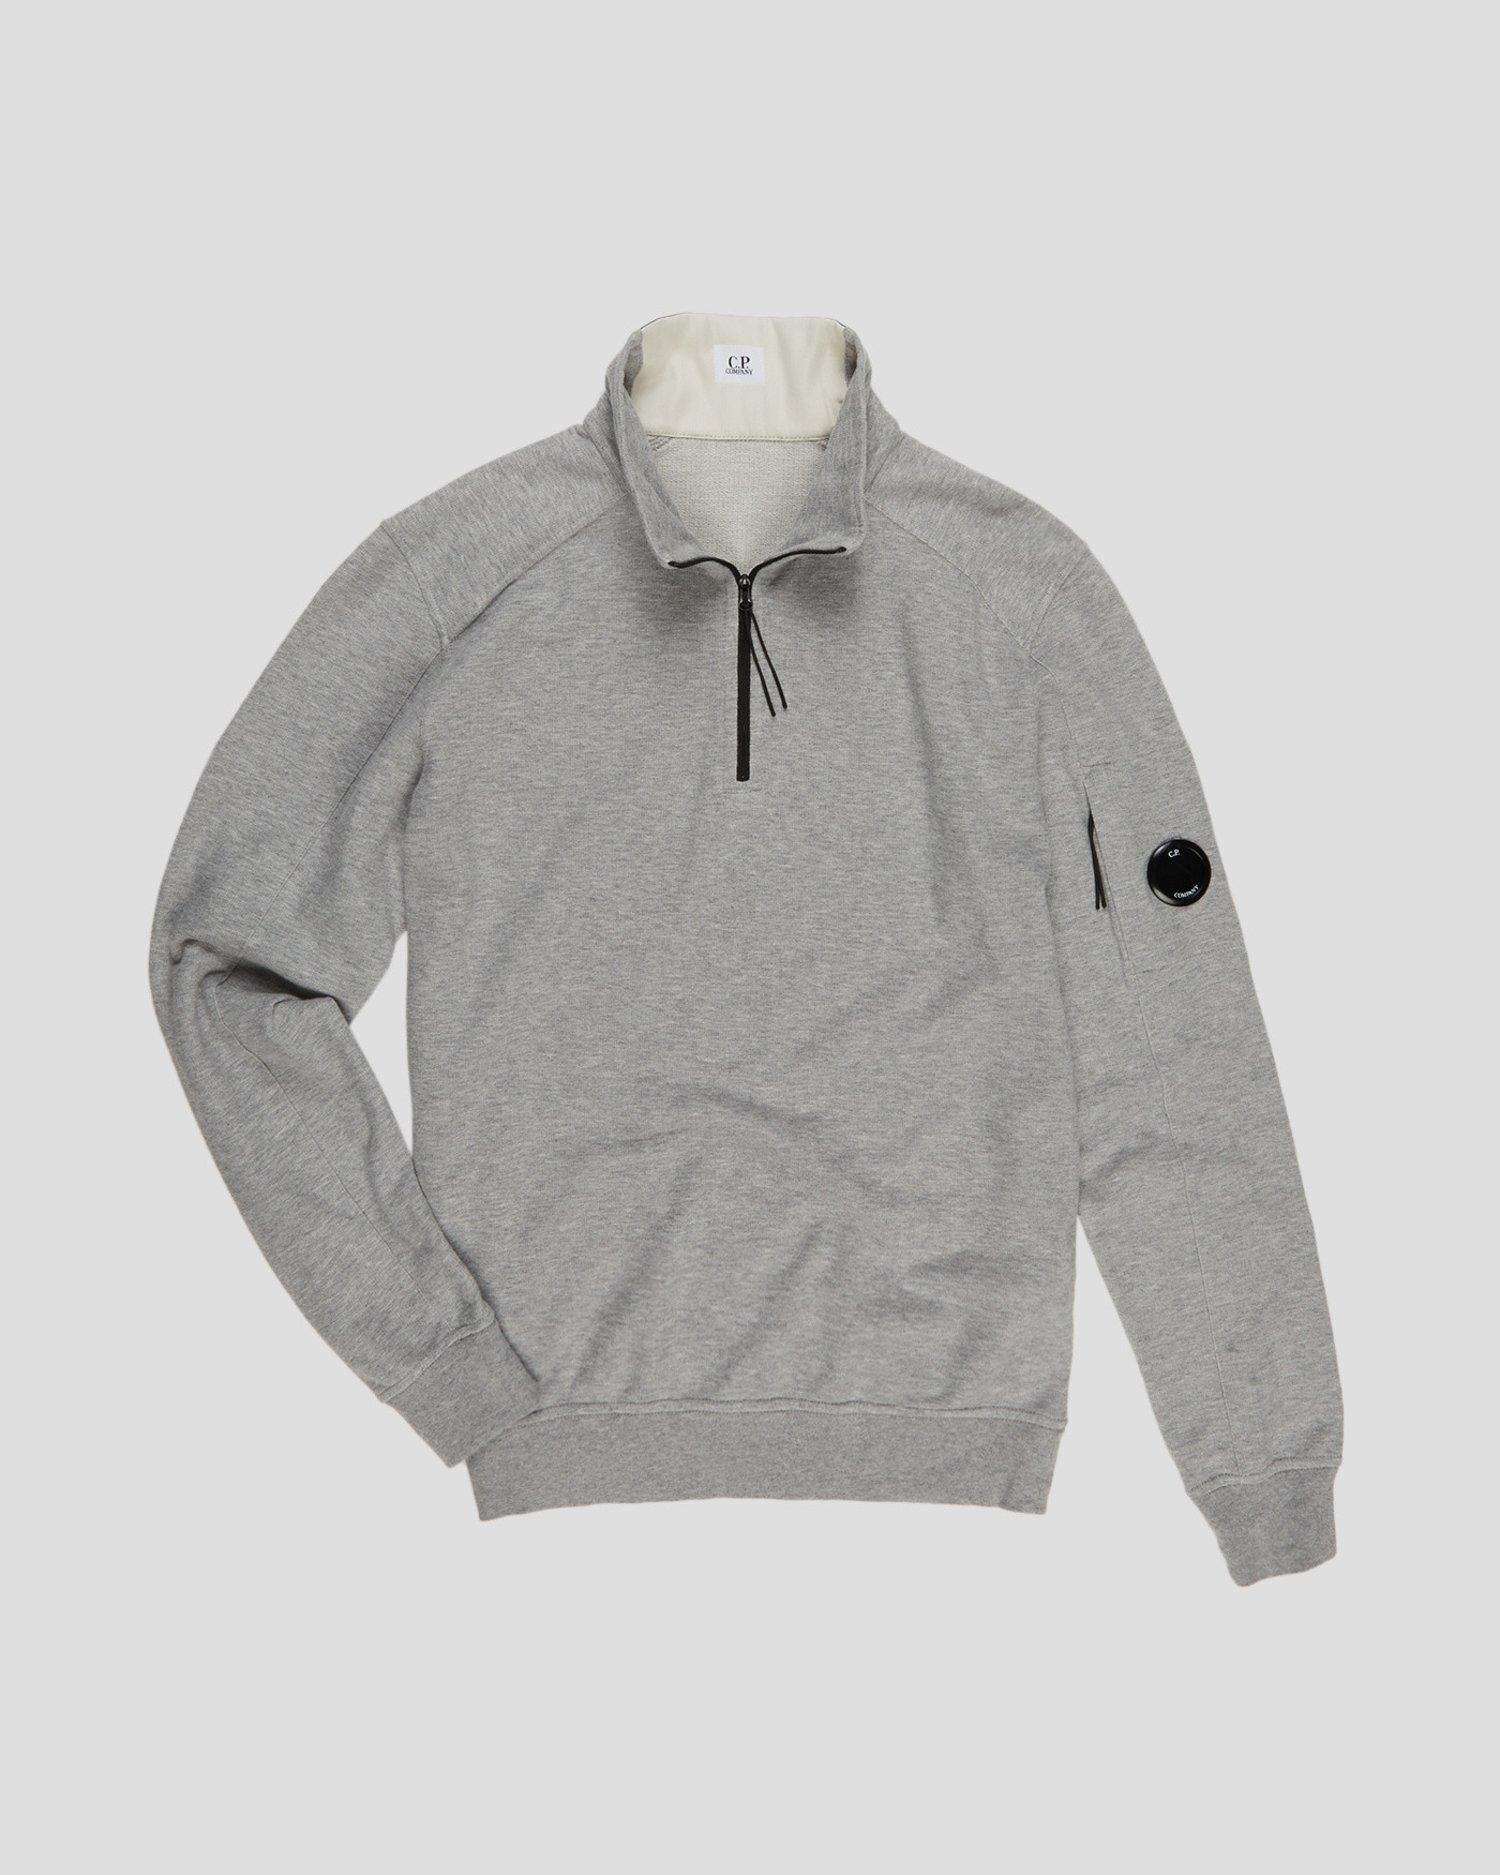 Habit Brand Men/'s Hooded Performance Long Sleeve Shirt Quarter Zip M XL XXL L